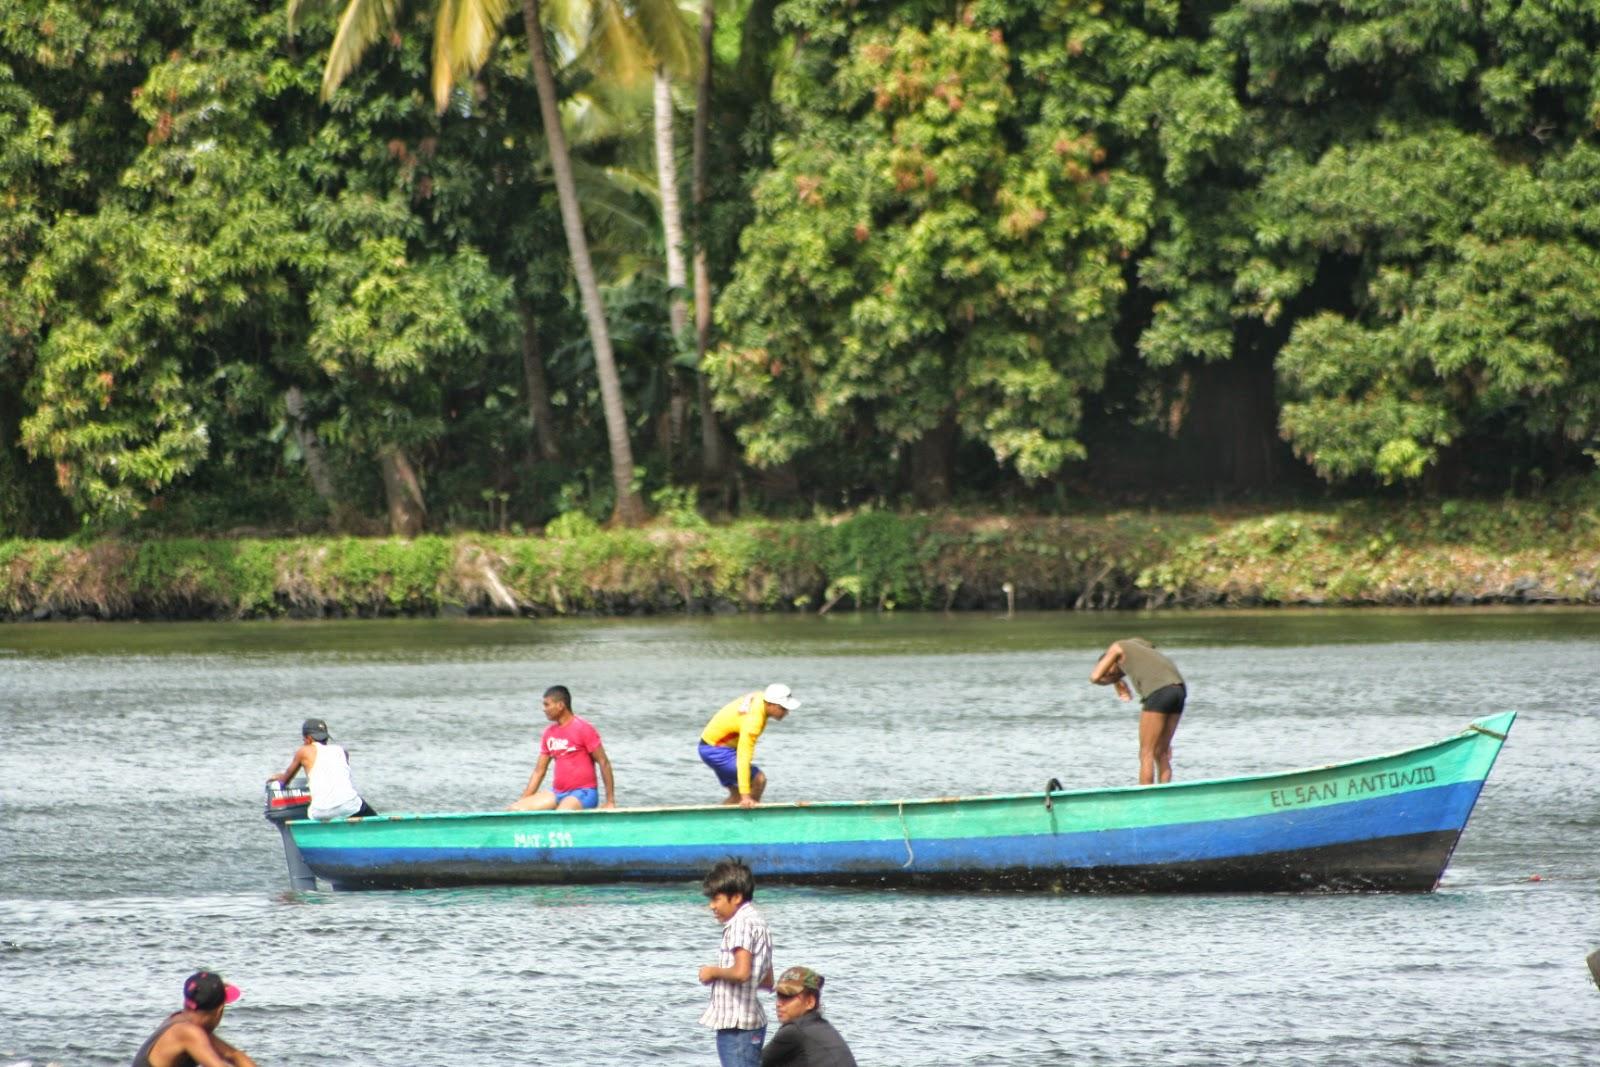 Escacez de peces en la Isla de Ometepe